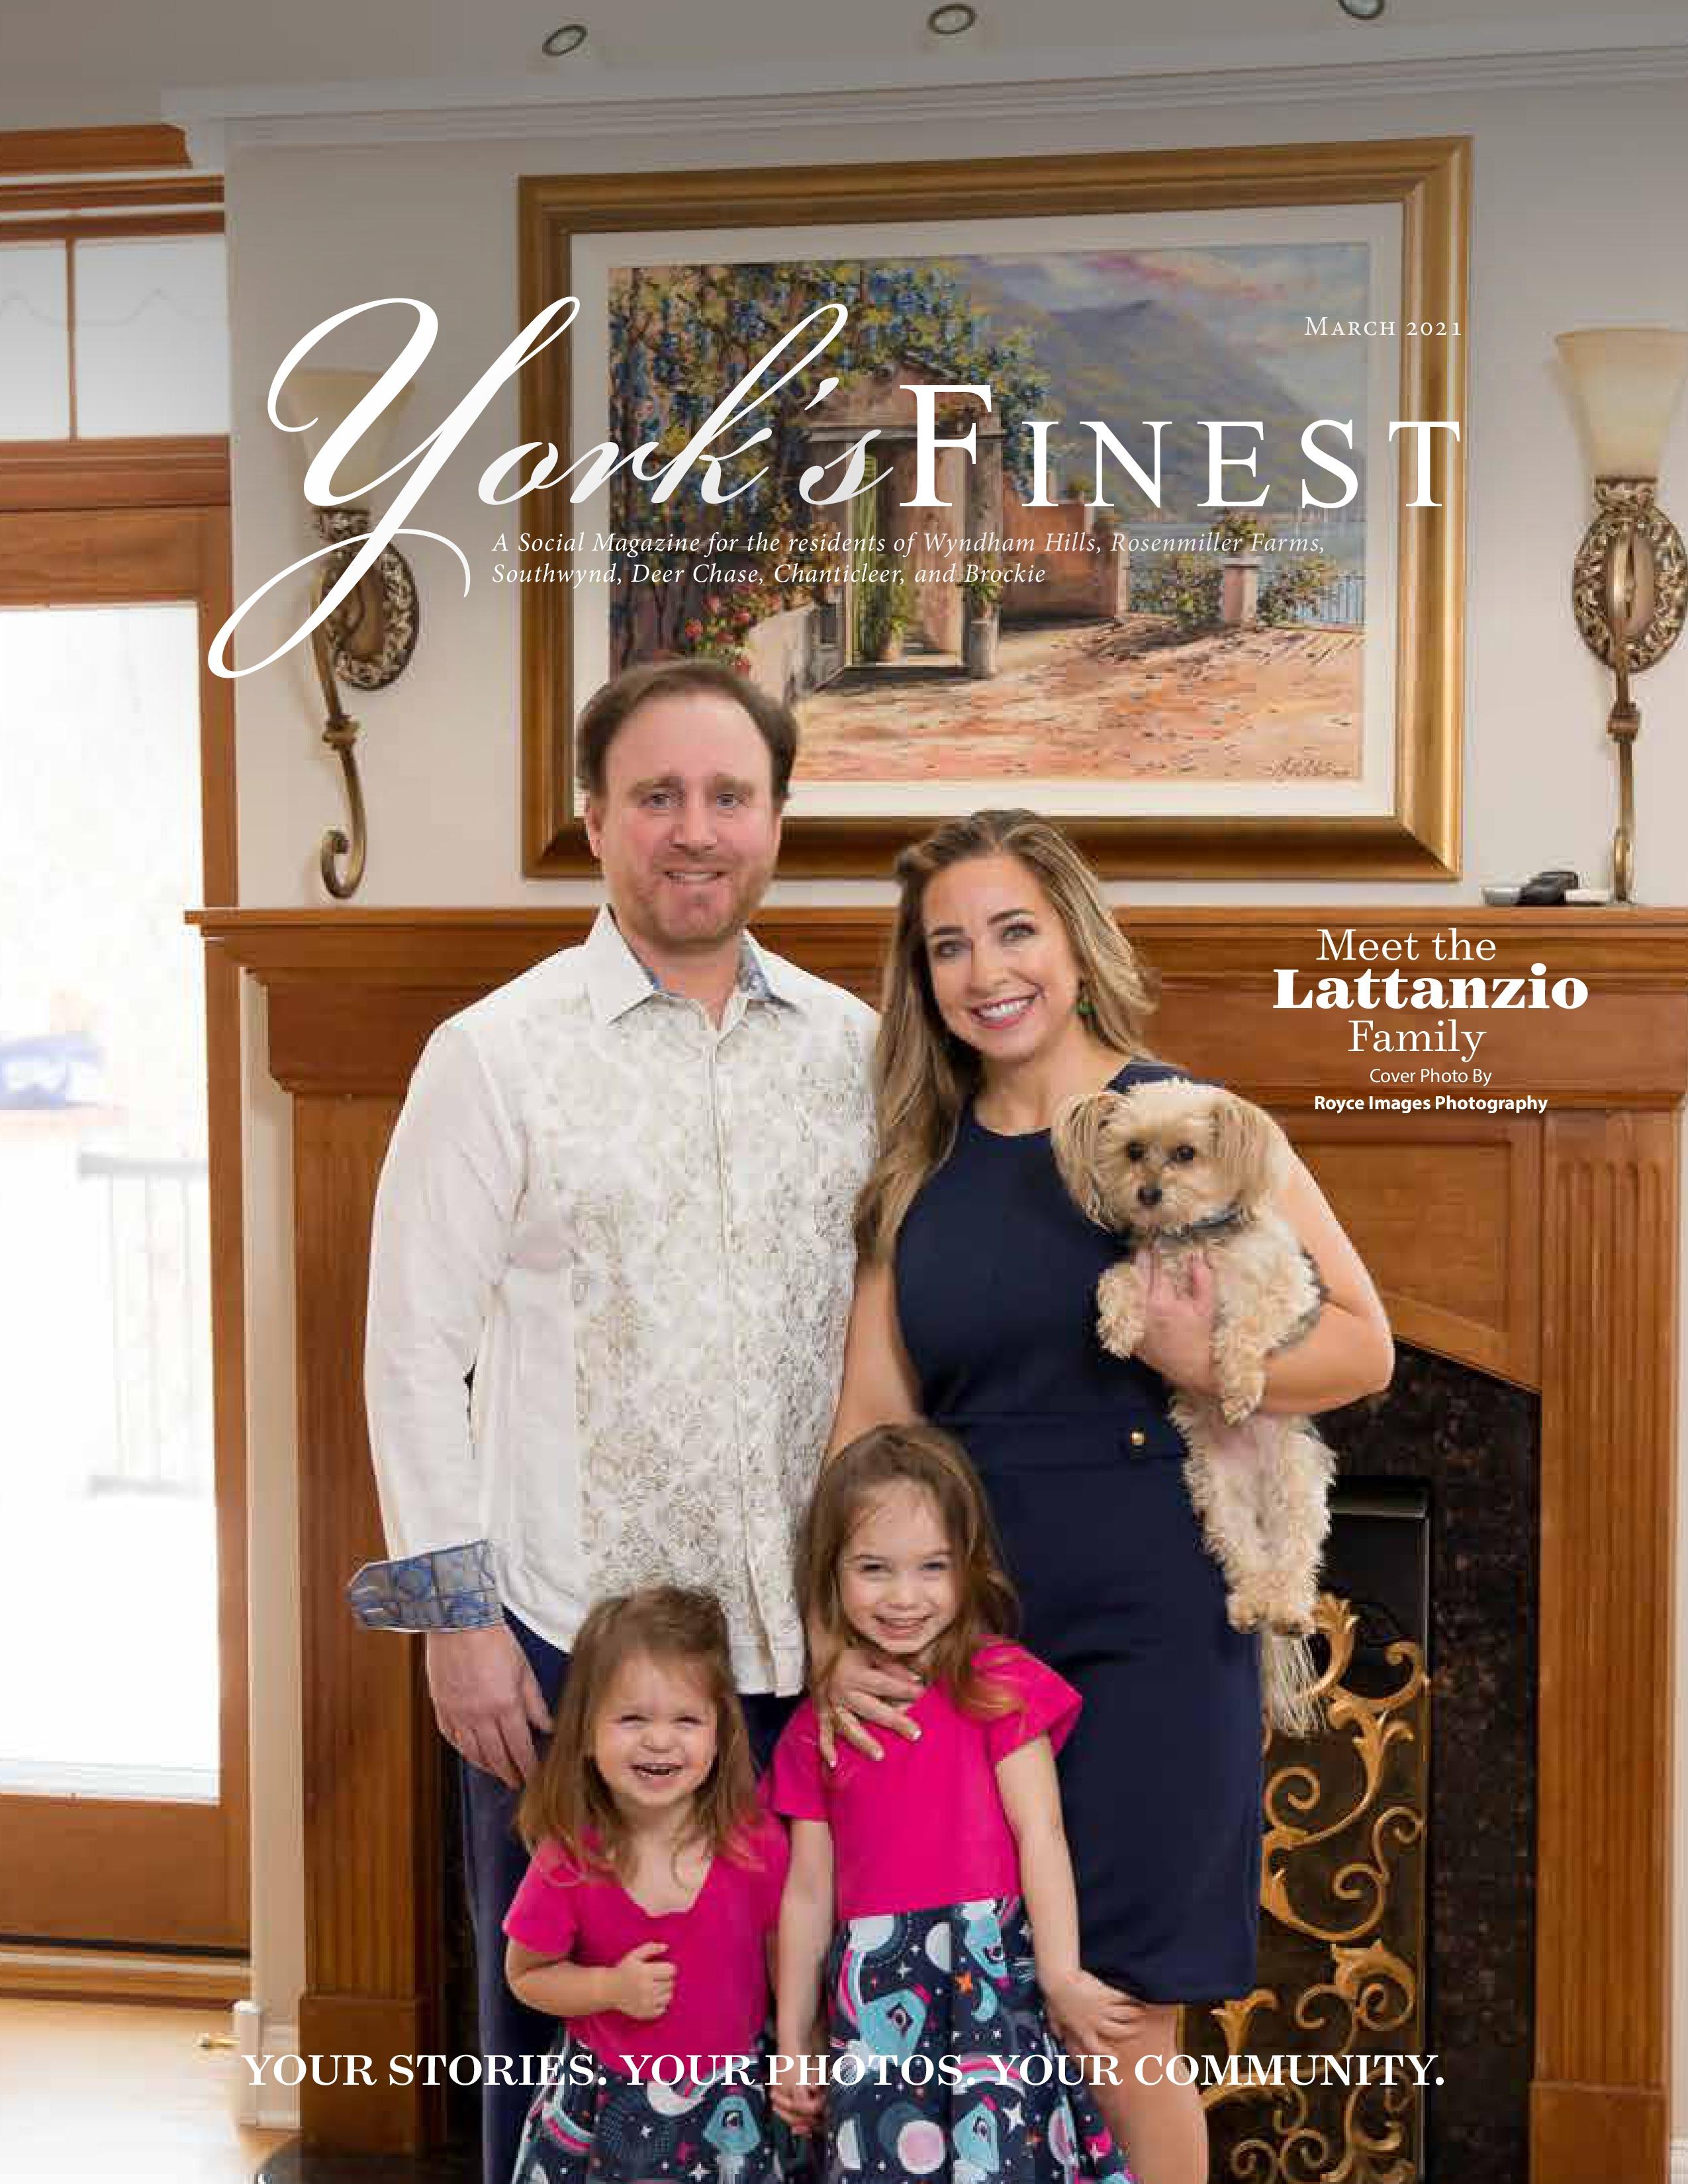 York's Finest 2021-03-01